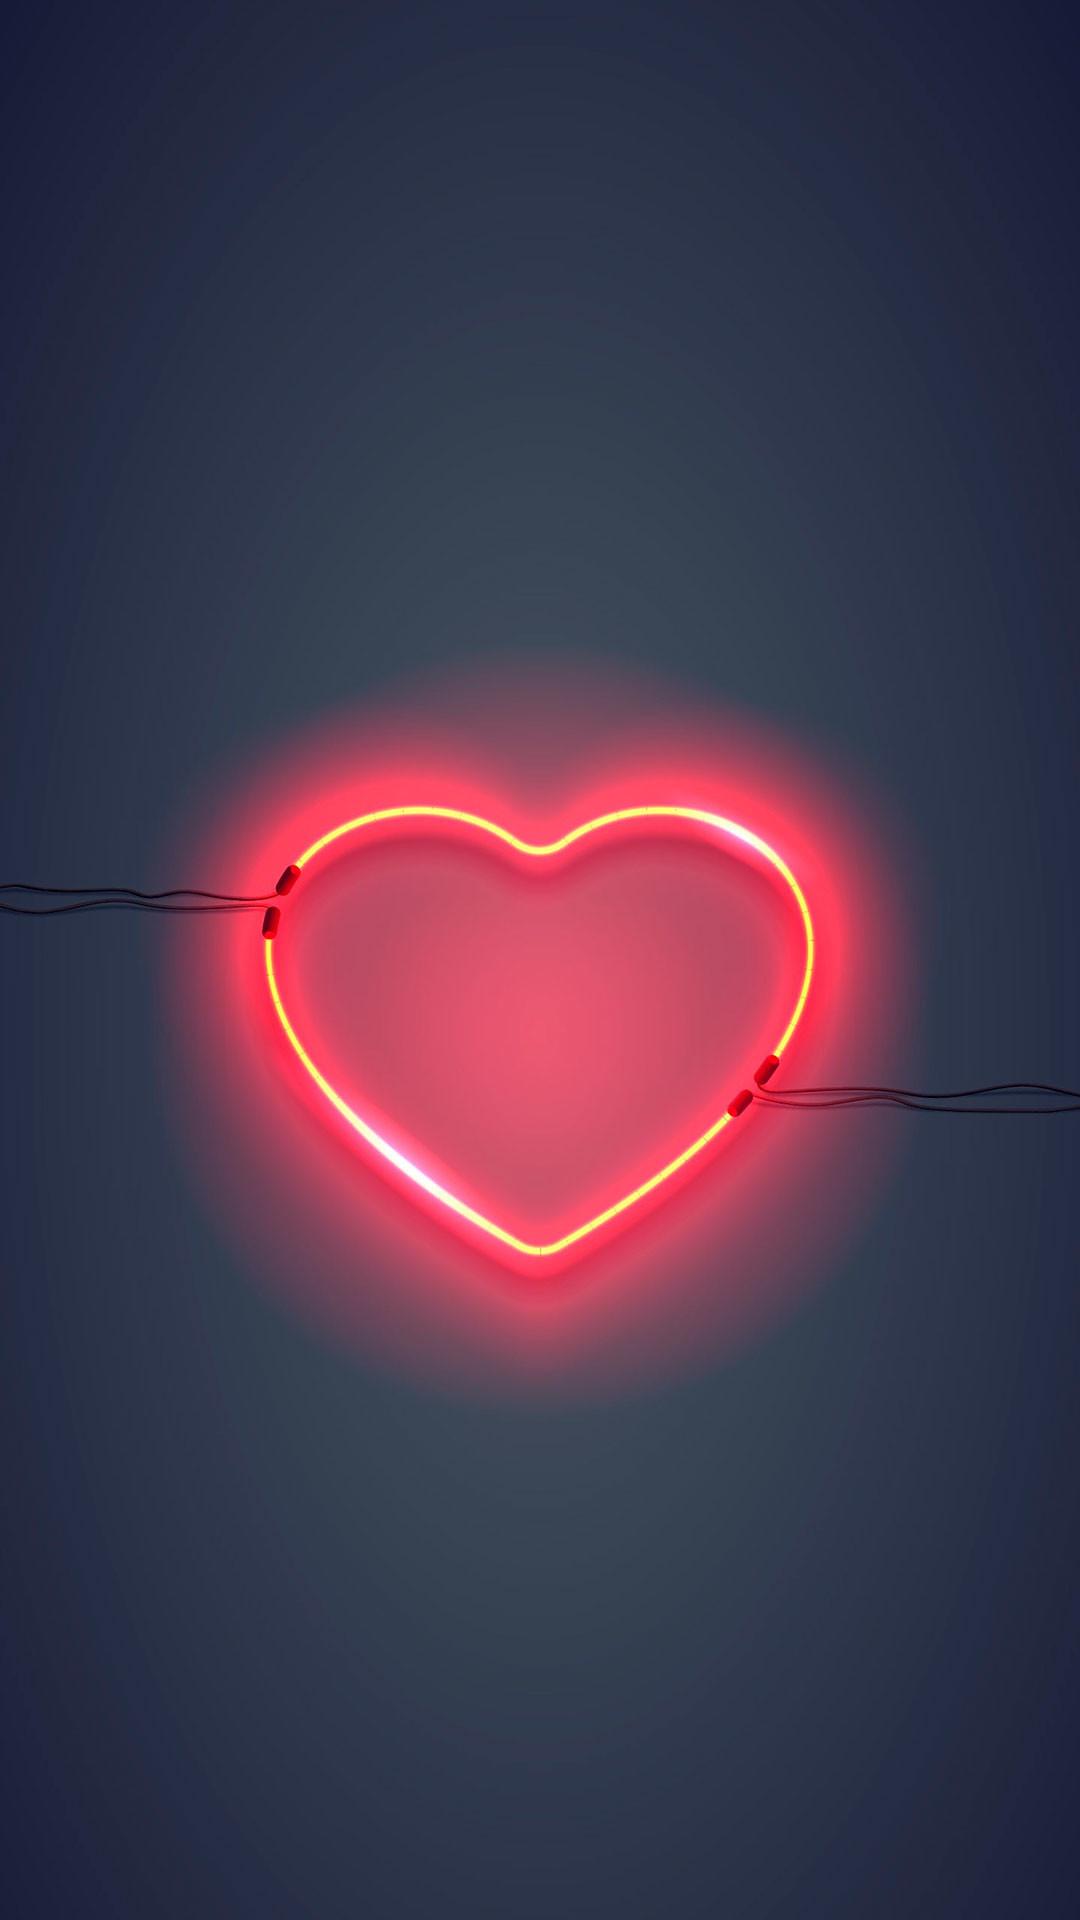 Iphone Wallpaper Neon Sign Heart Neon Sign - Neon Lights - HD Wallpaper